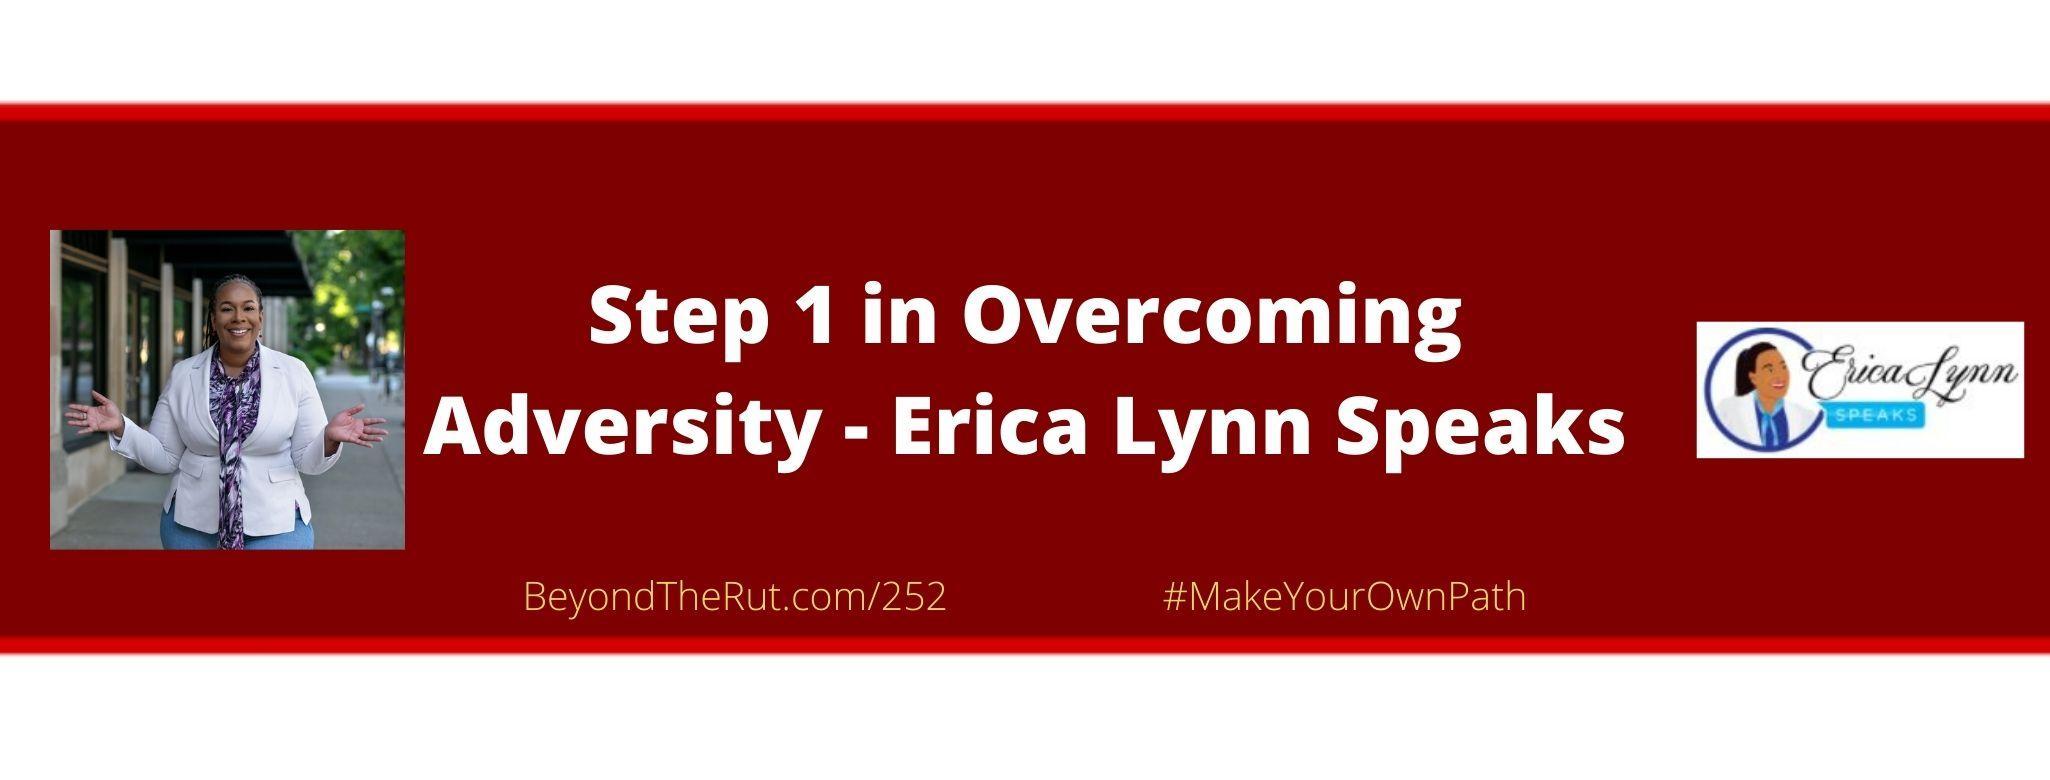 overcoming adversity erica lynn speaks